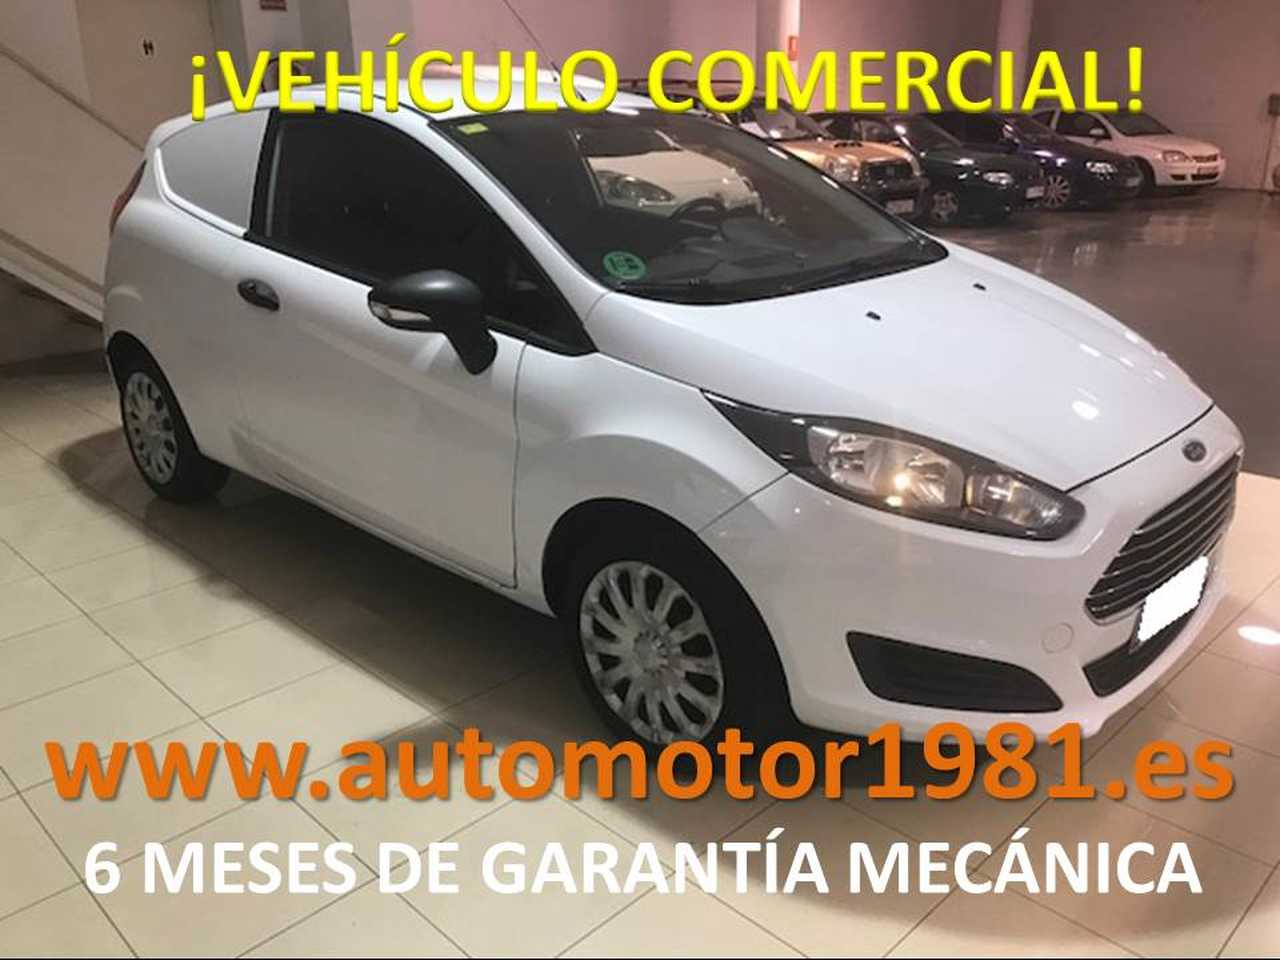 Ford Fiesta Van 1.5 TDCi - 6 MESES GARANTIA MECANICA  - Foto 1